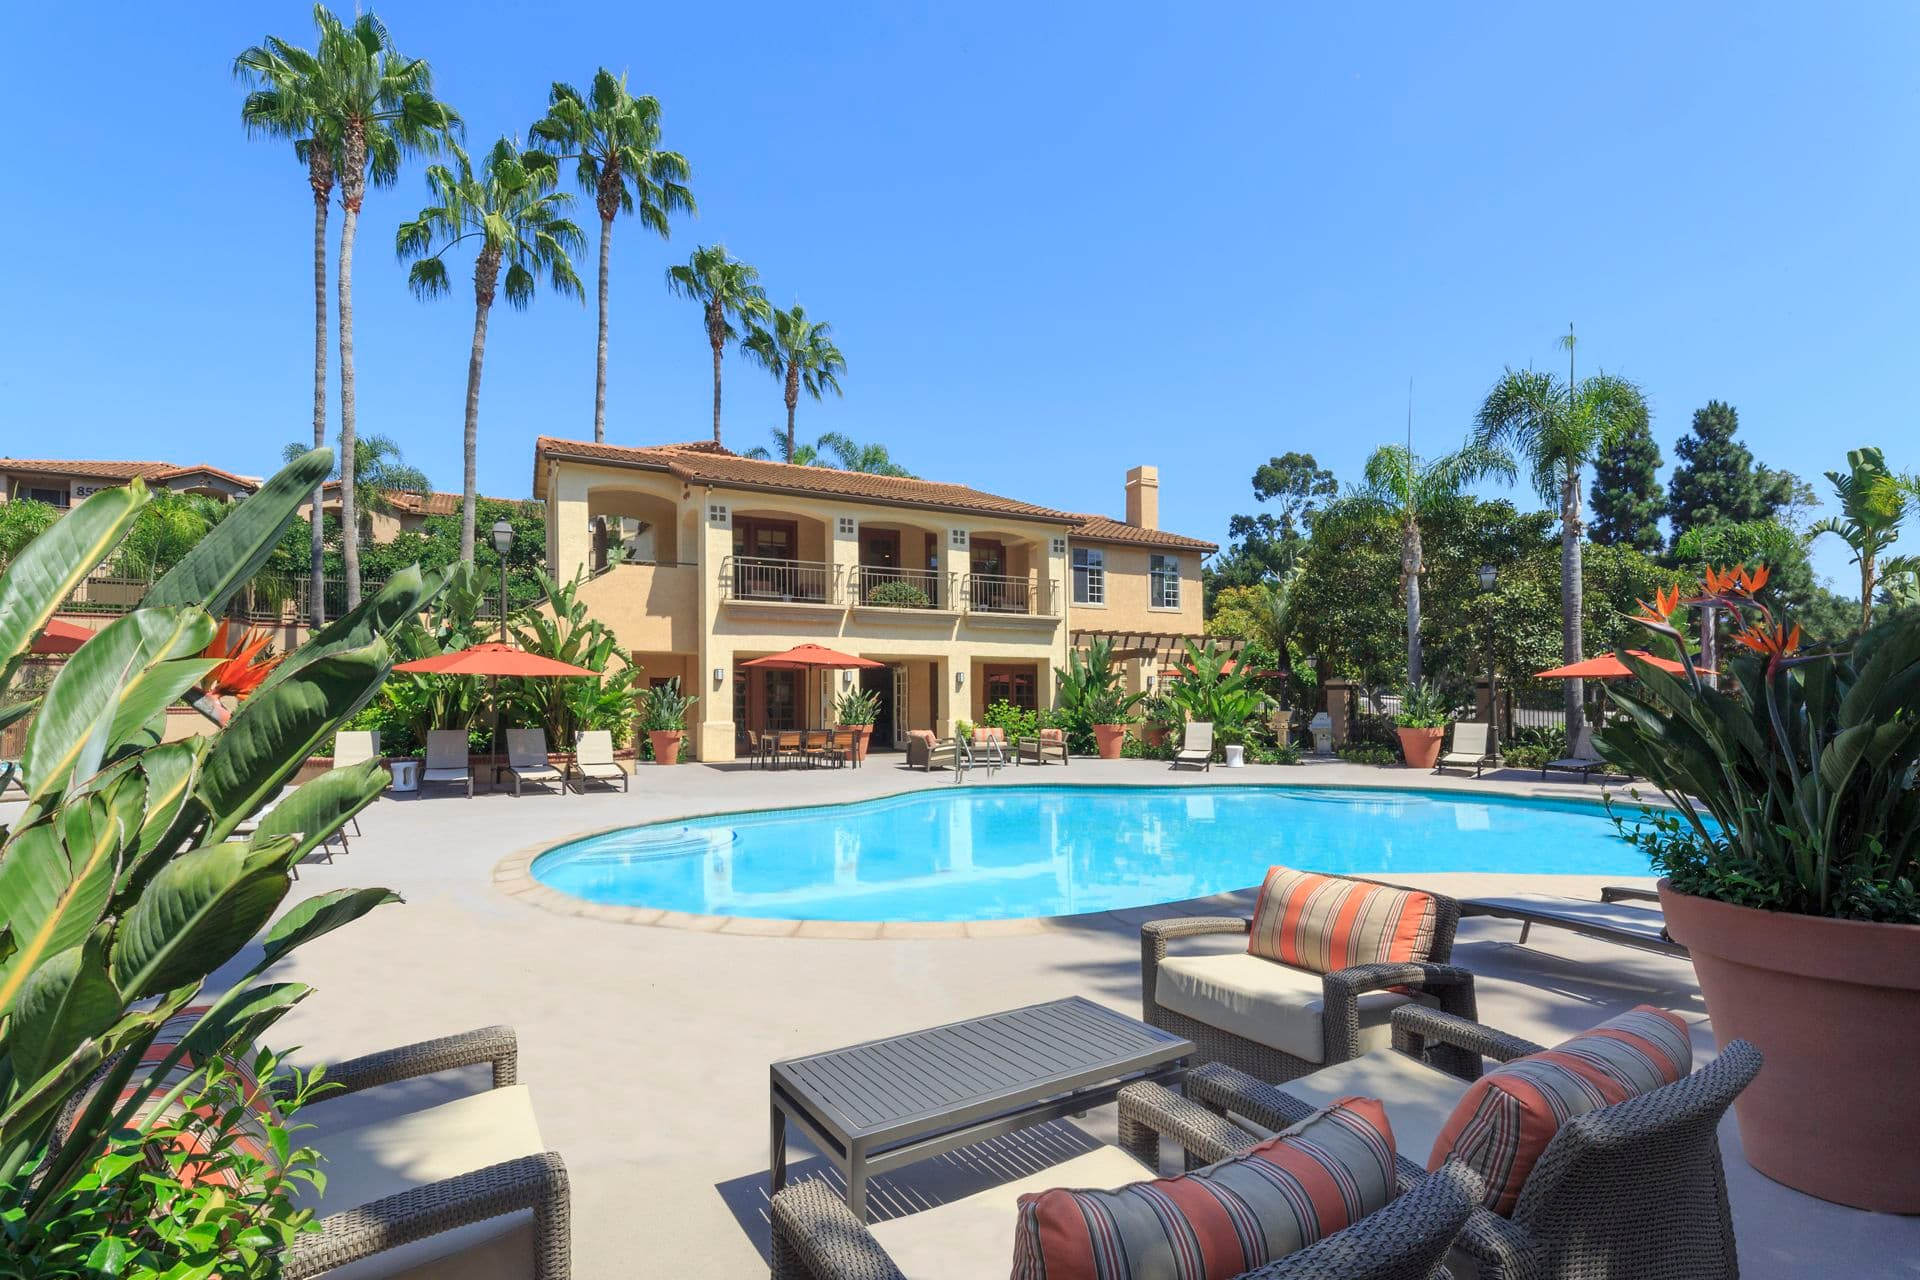 Exterior view of pool at Solazzo Apartment Homes in La Jolla, CA.